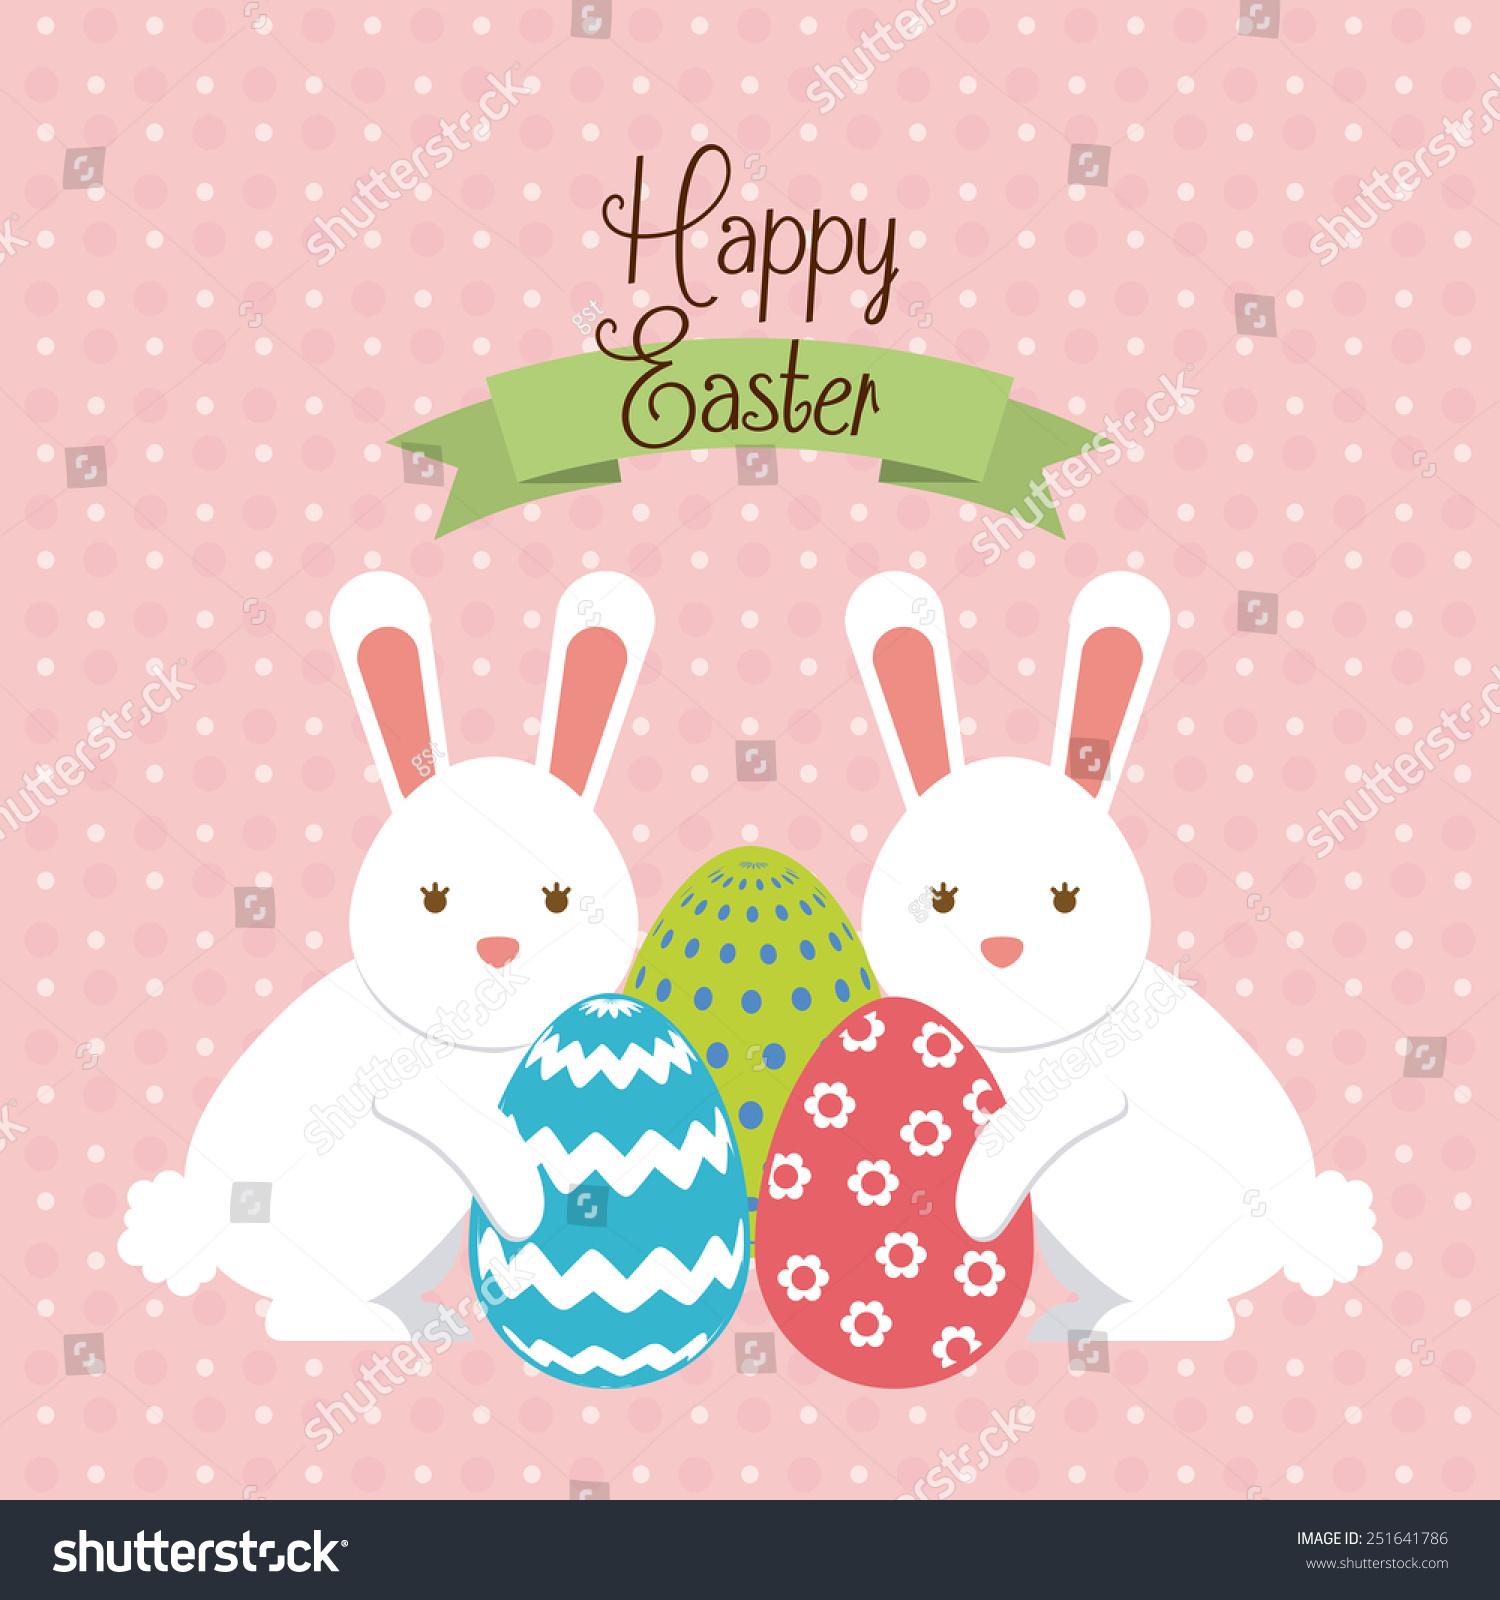 Happy Easter Design Vector Illustration Eps10 Stock Vector ...